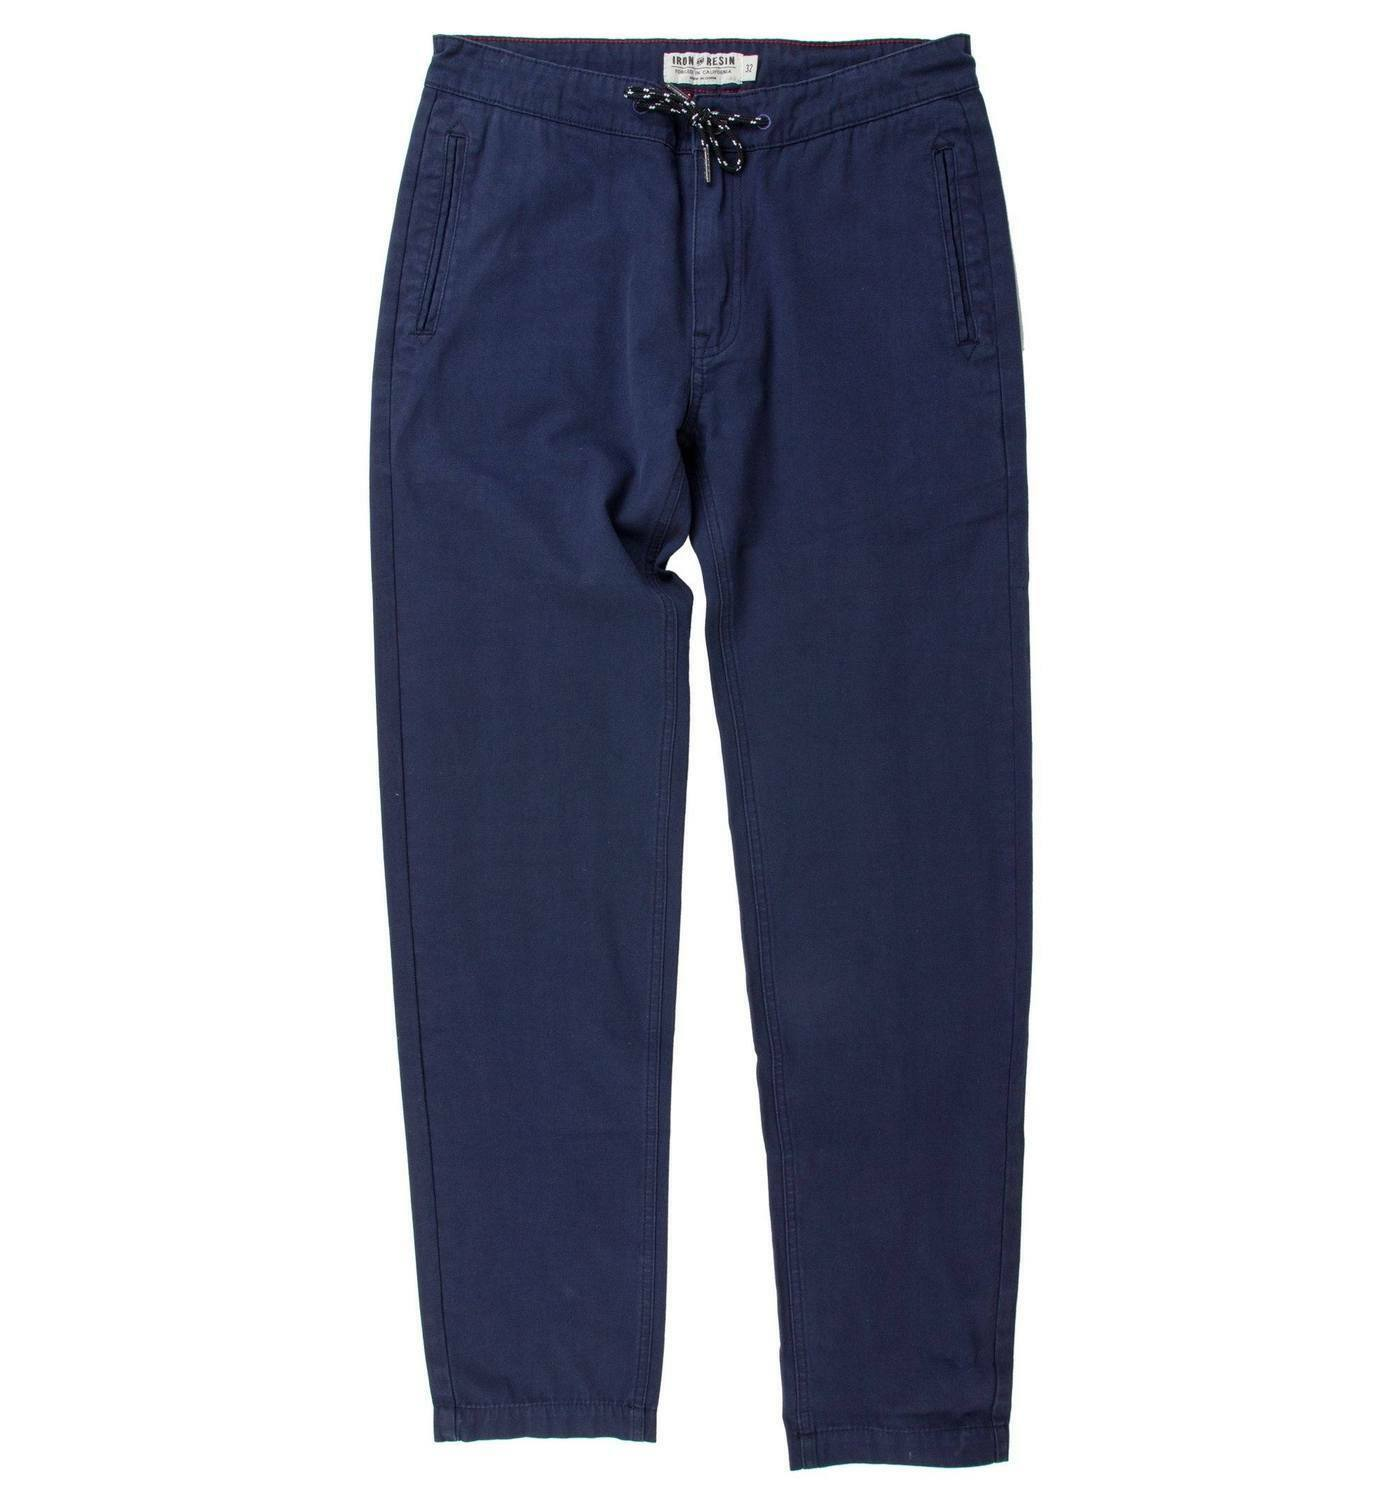 2018 NWT MENS IRON AND RESIN CURRIN PANT  30 Navy elastic waist